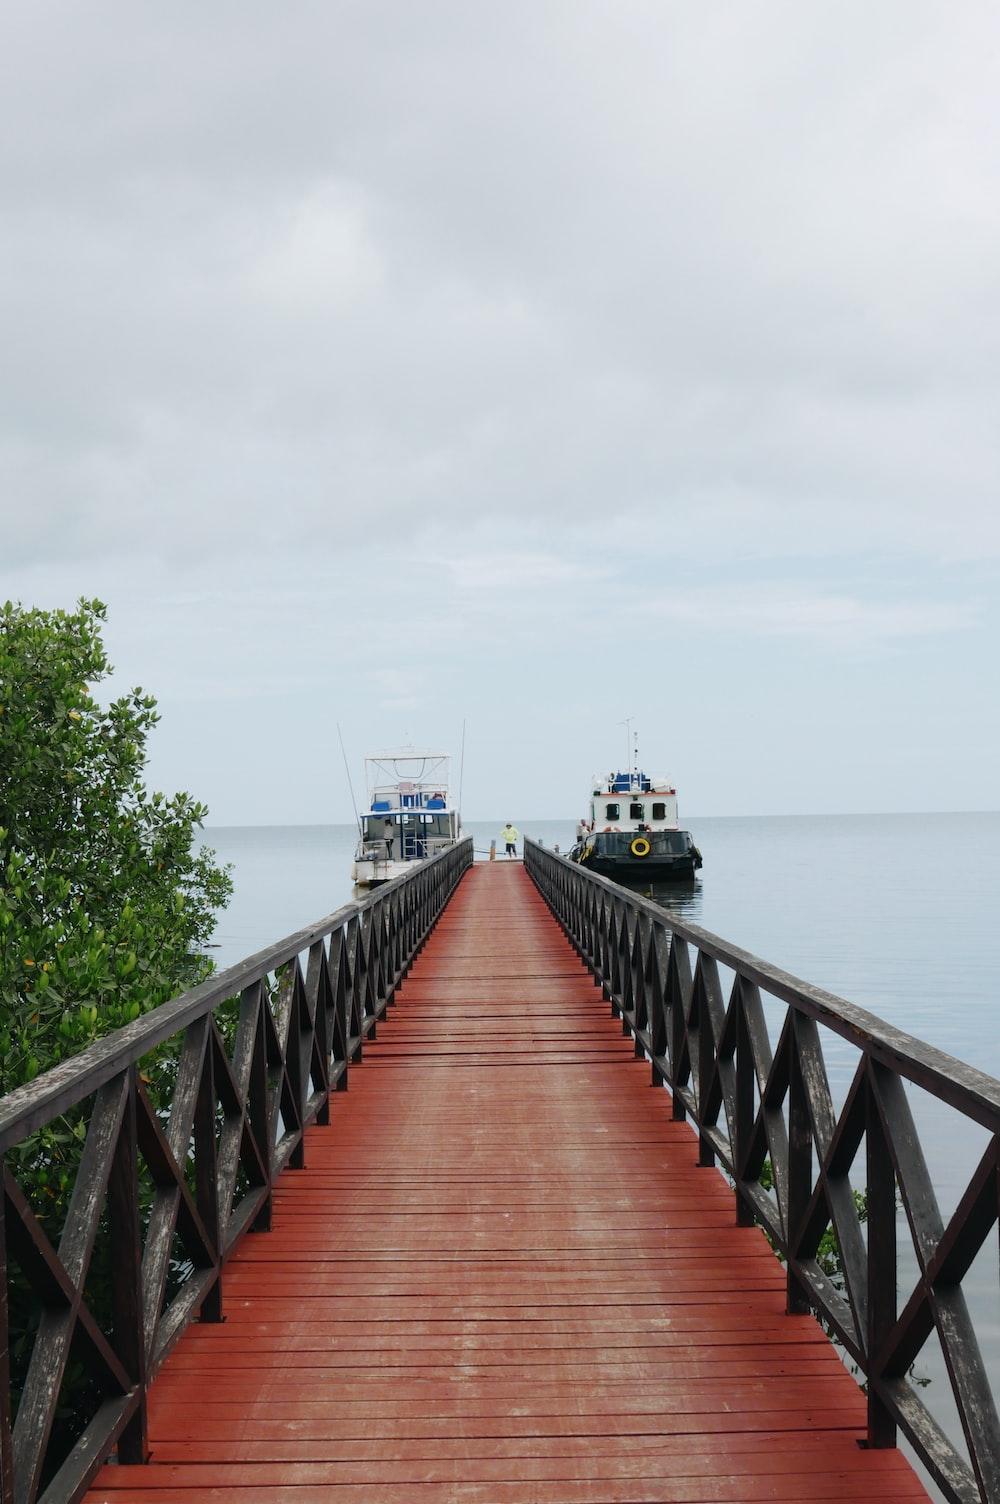 black and maroon dock towards ships